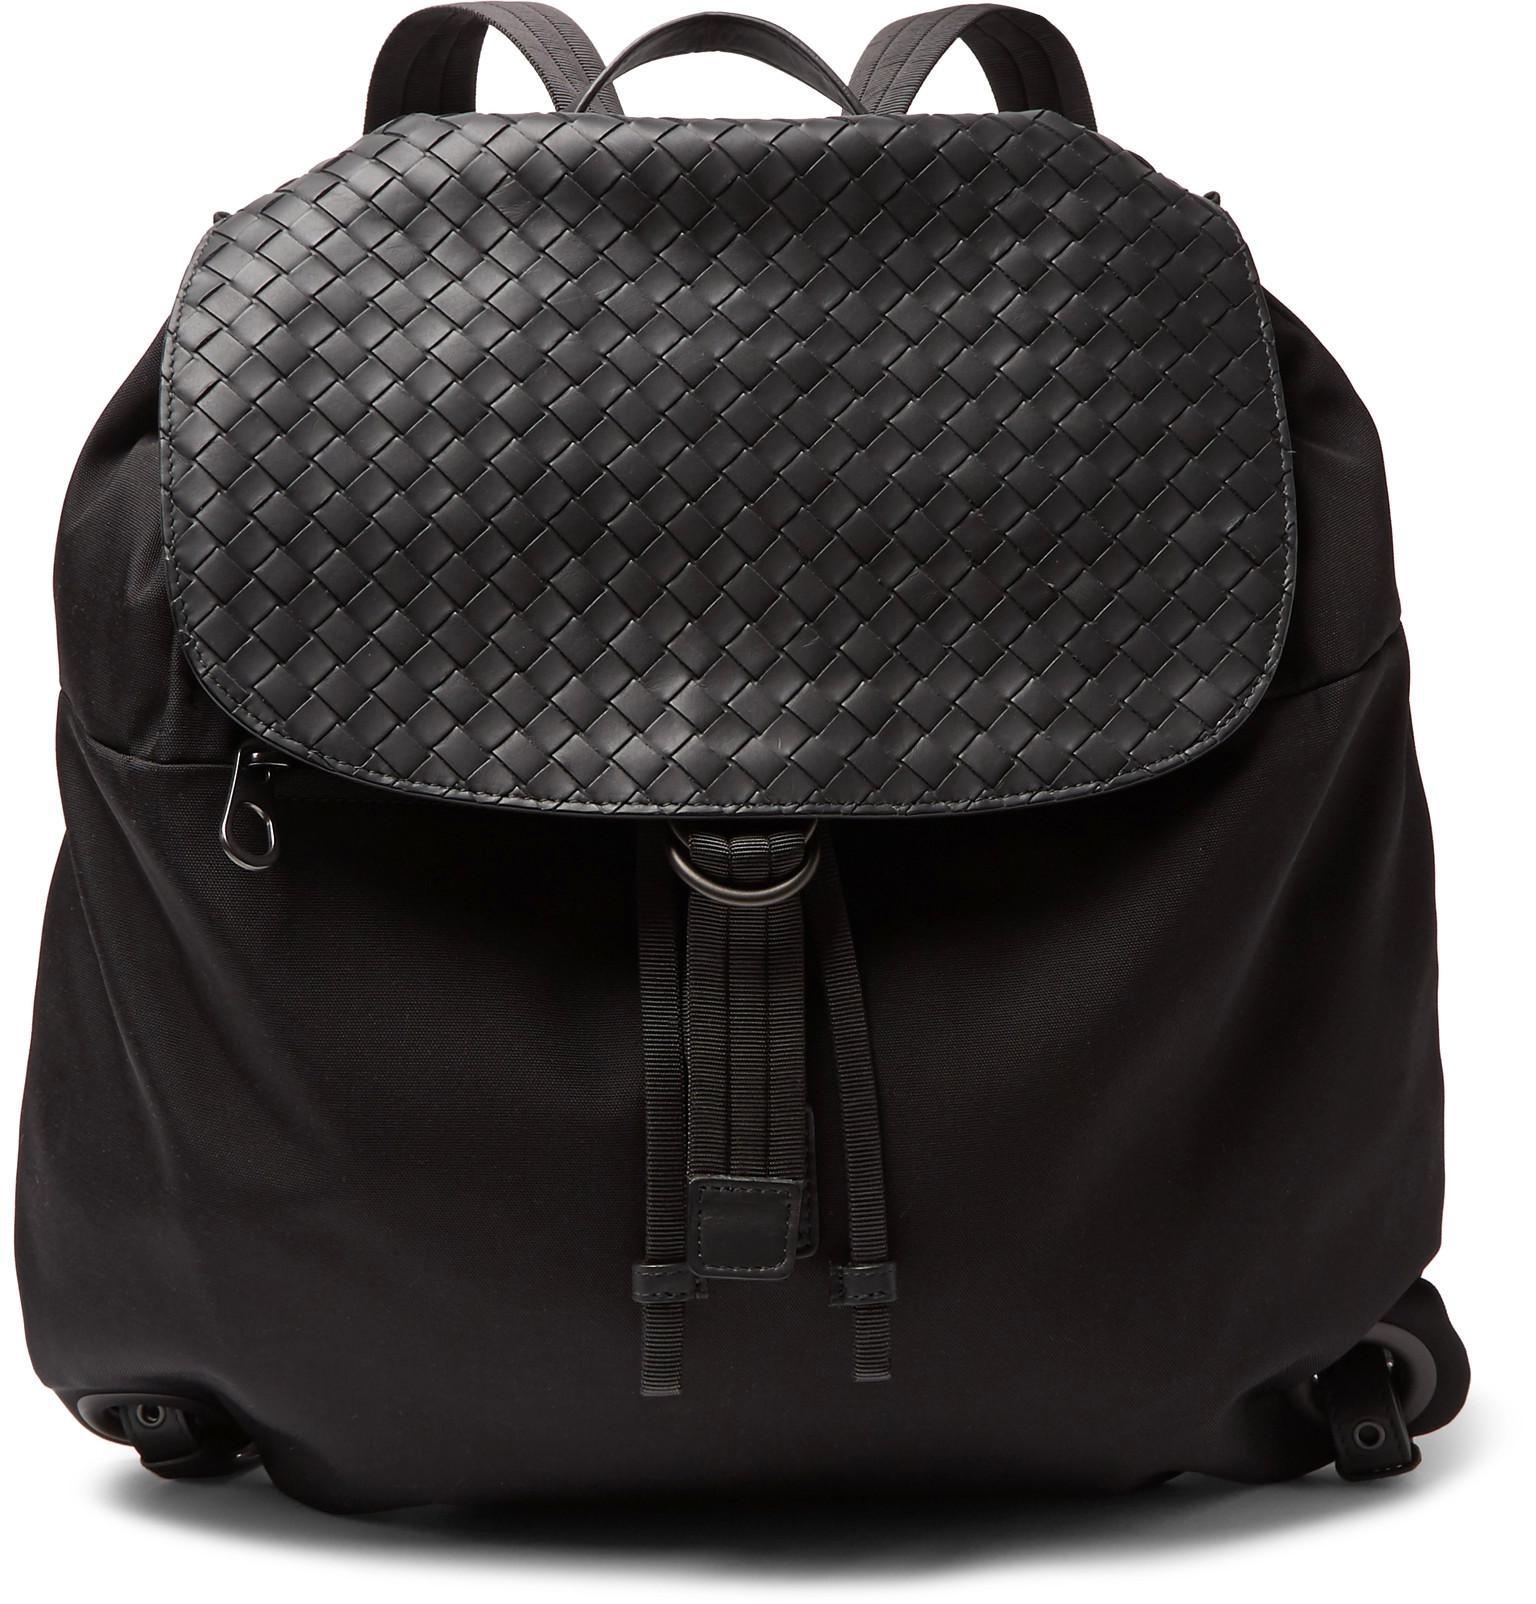 068f660064f3 Lyst - Bottega Veneta Intrecciato Leather-panelled Canvas Backpack ...